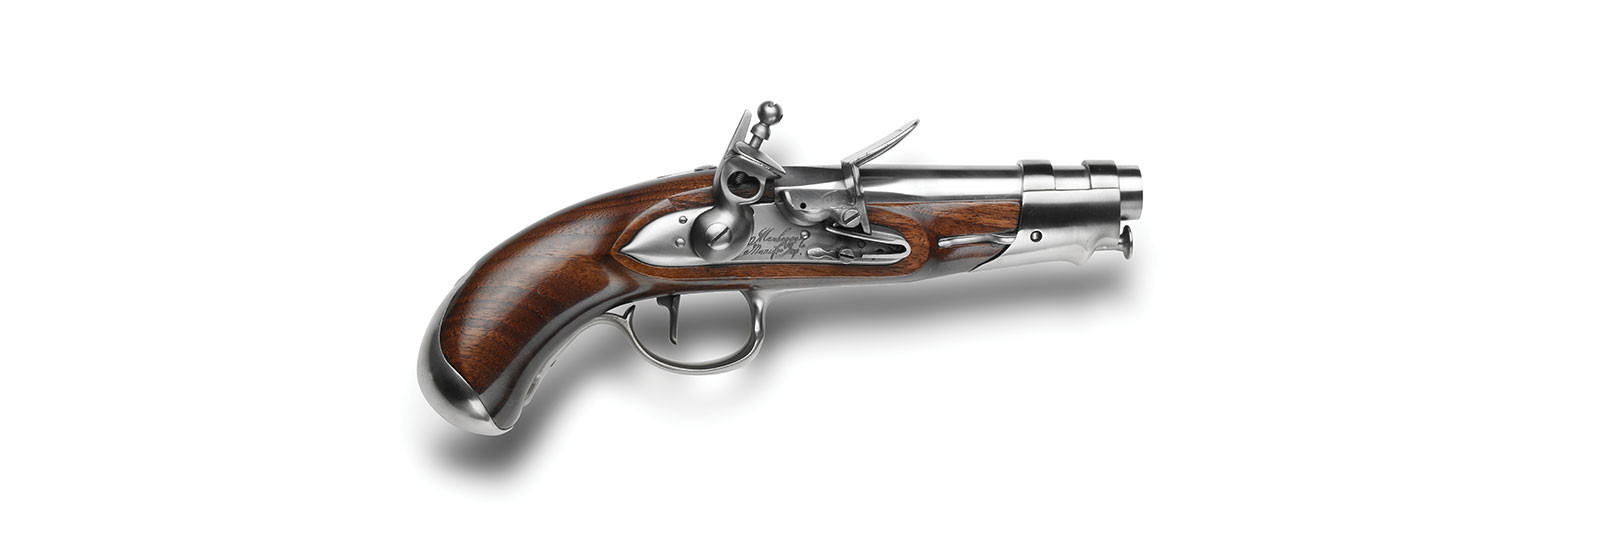 Pistola An IX De Gendarmerie